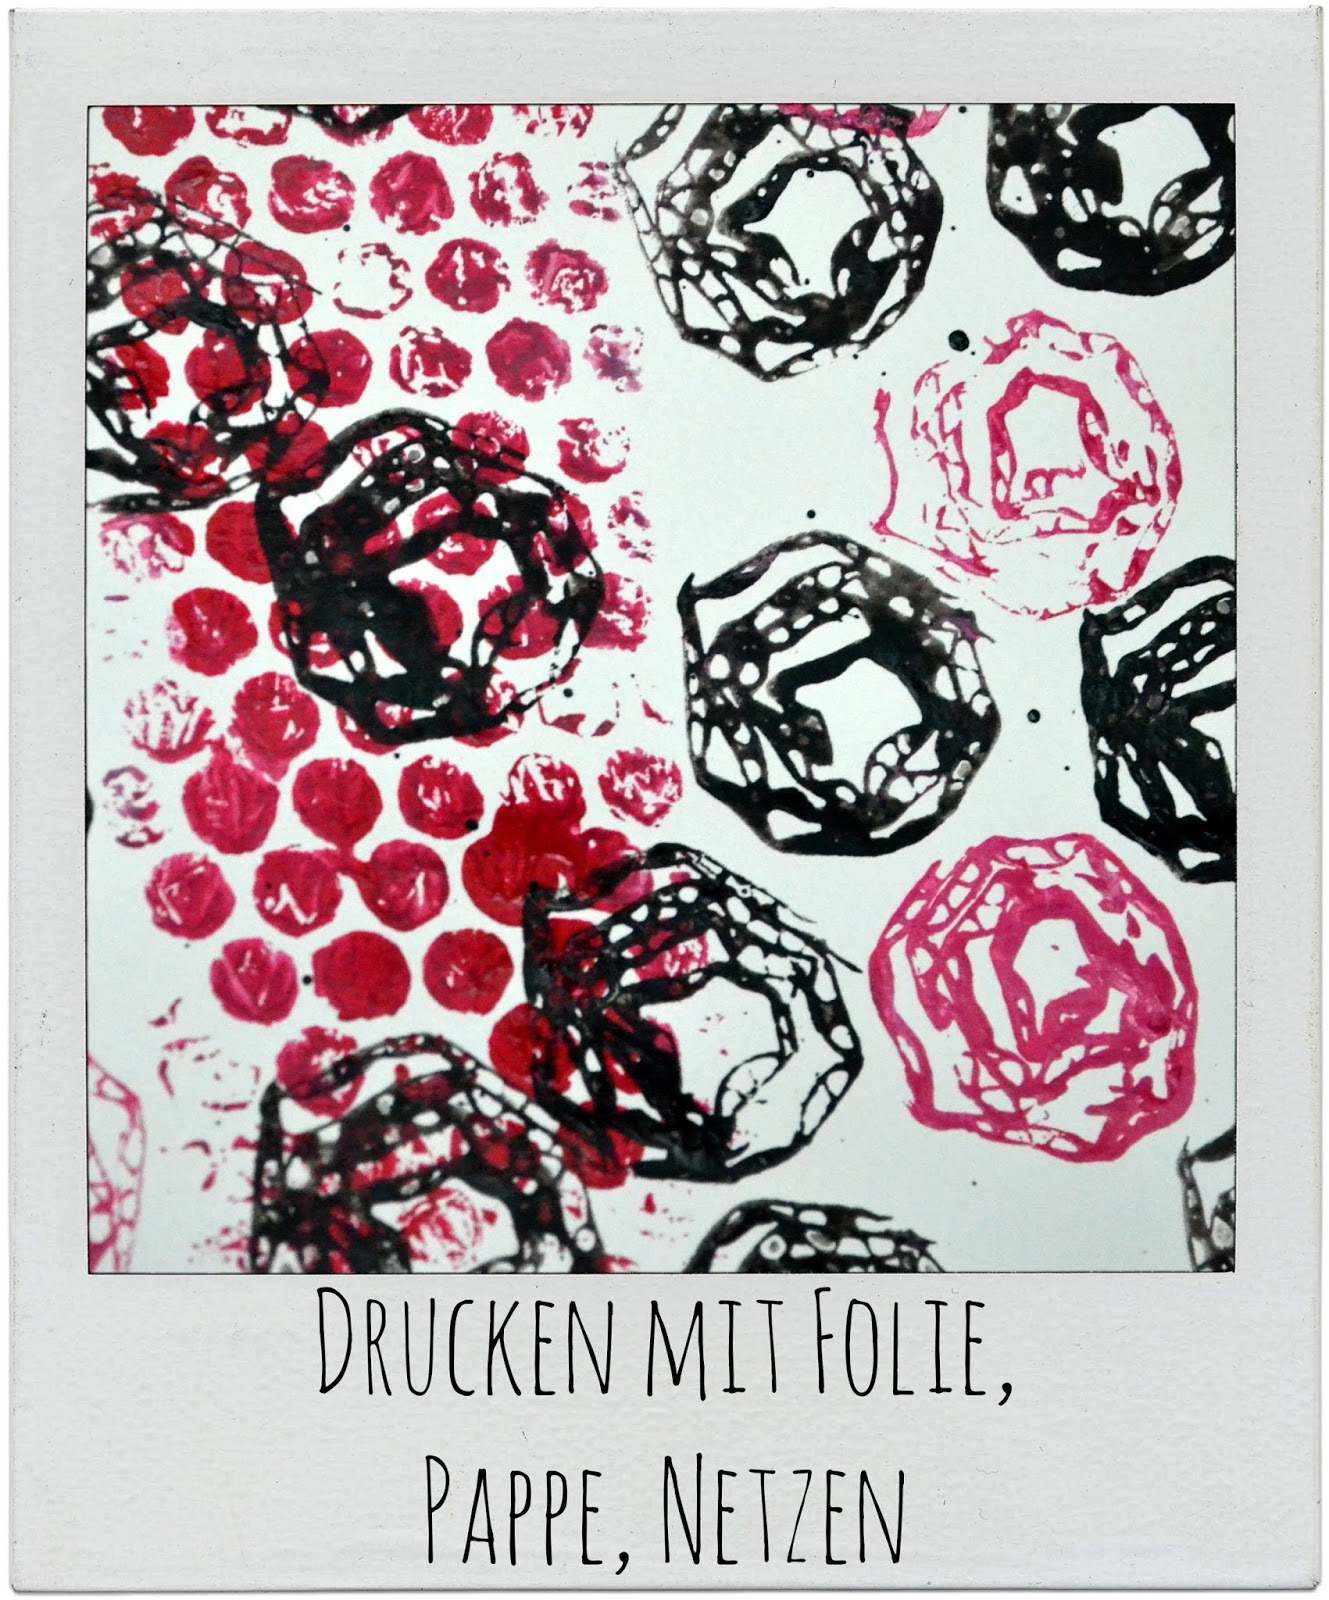 http://gemachtesundgedachtes.blogspot.de/2013/11/from-trash-to-blog-druckabfall.html